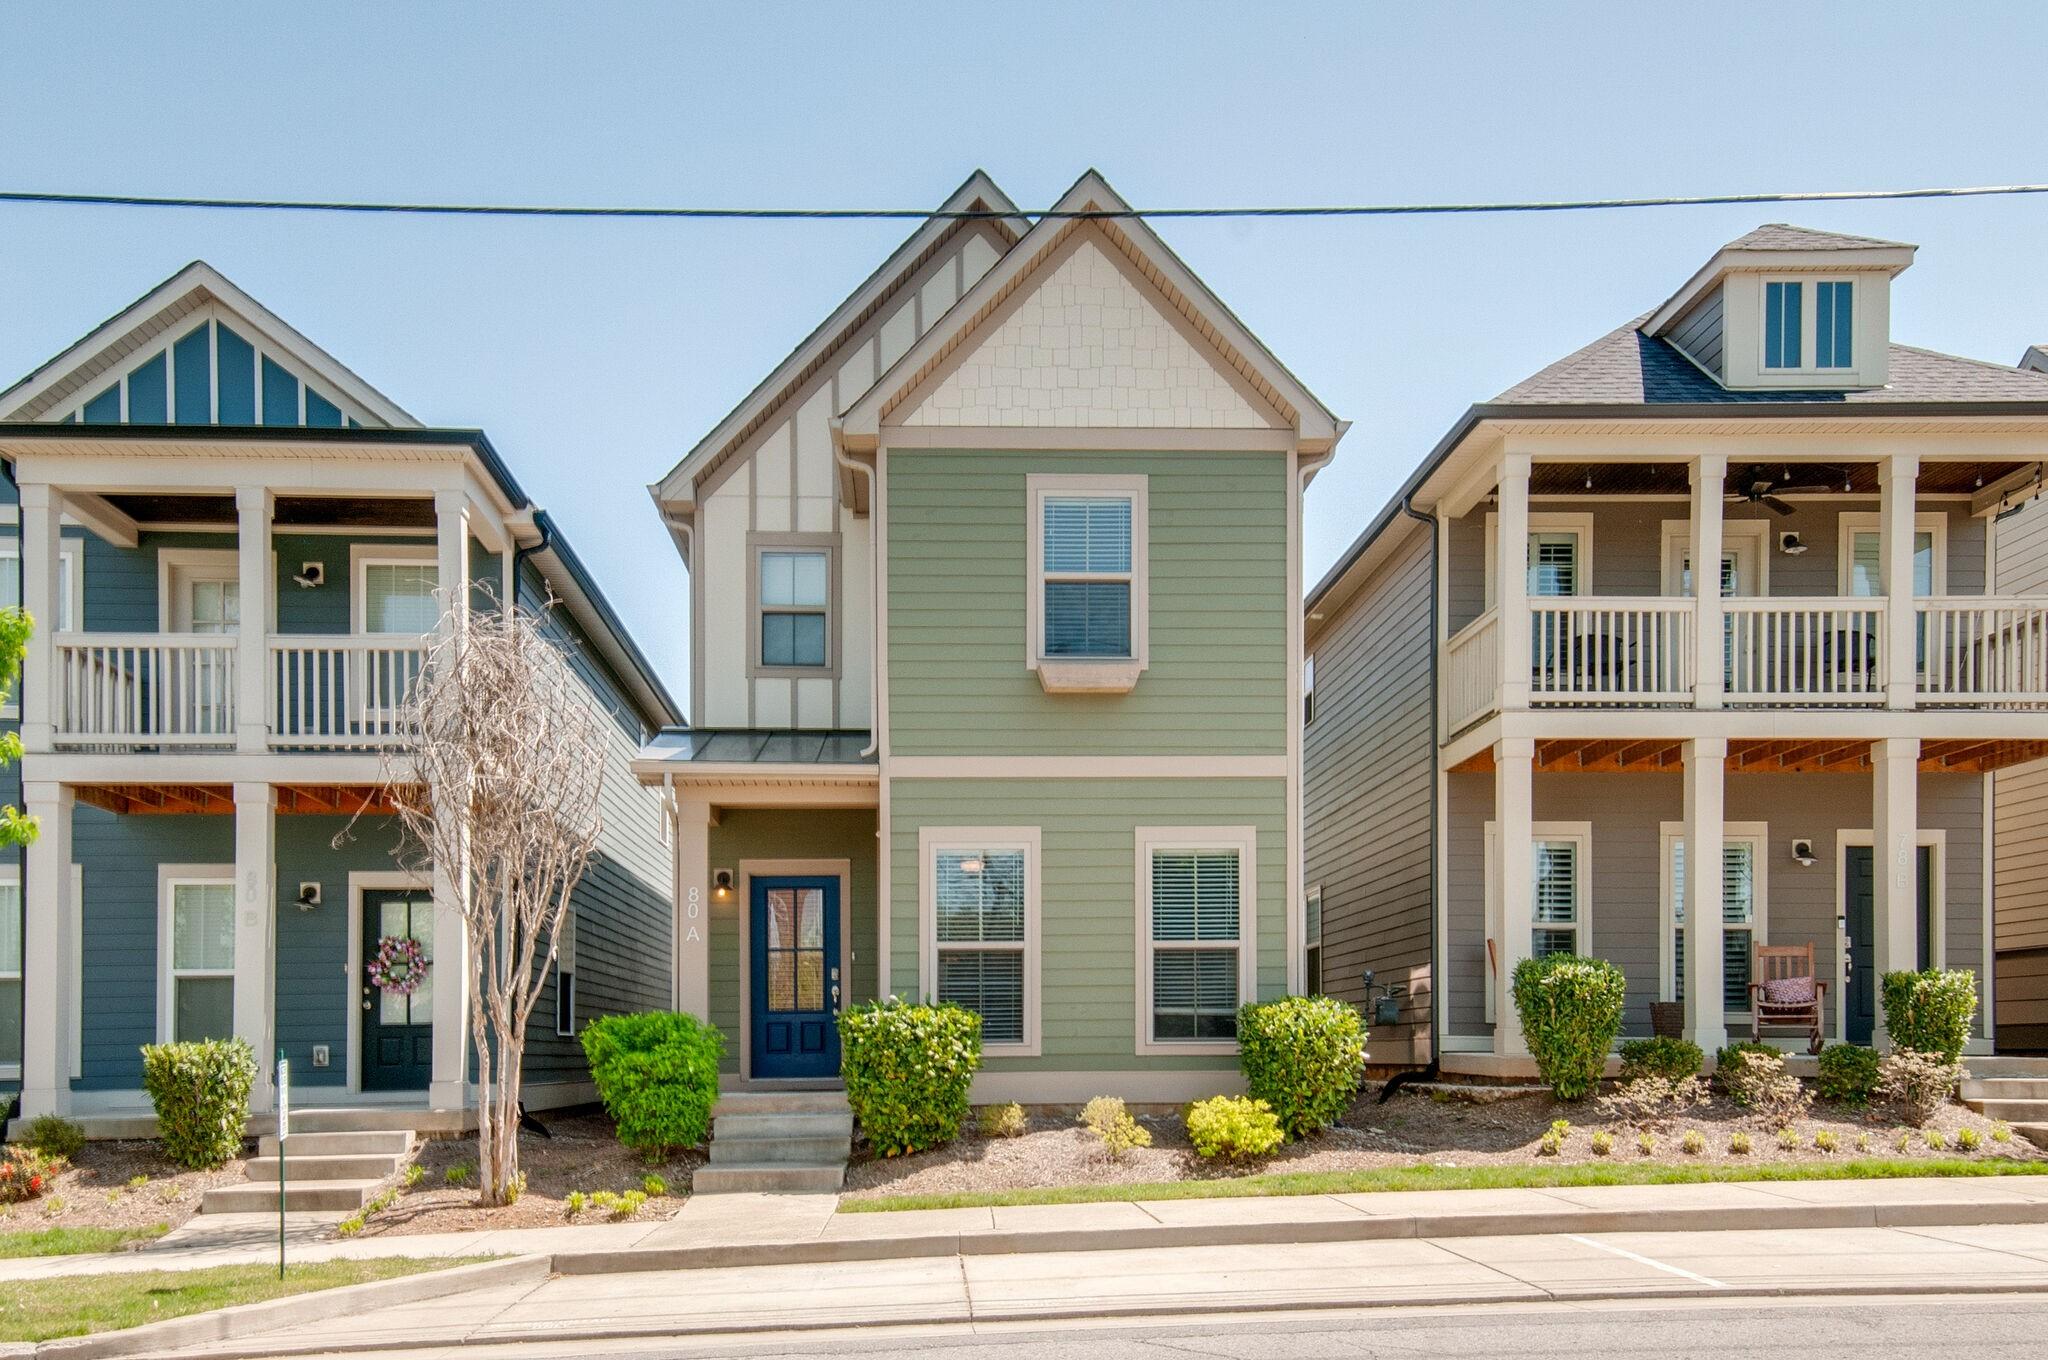 80A Nance Ln Property Photo - Nashville, TN real estate listing